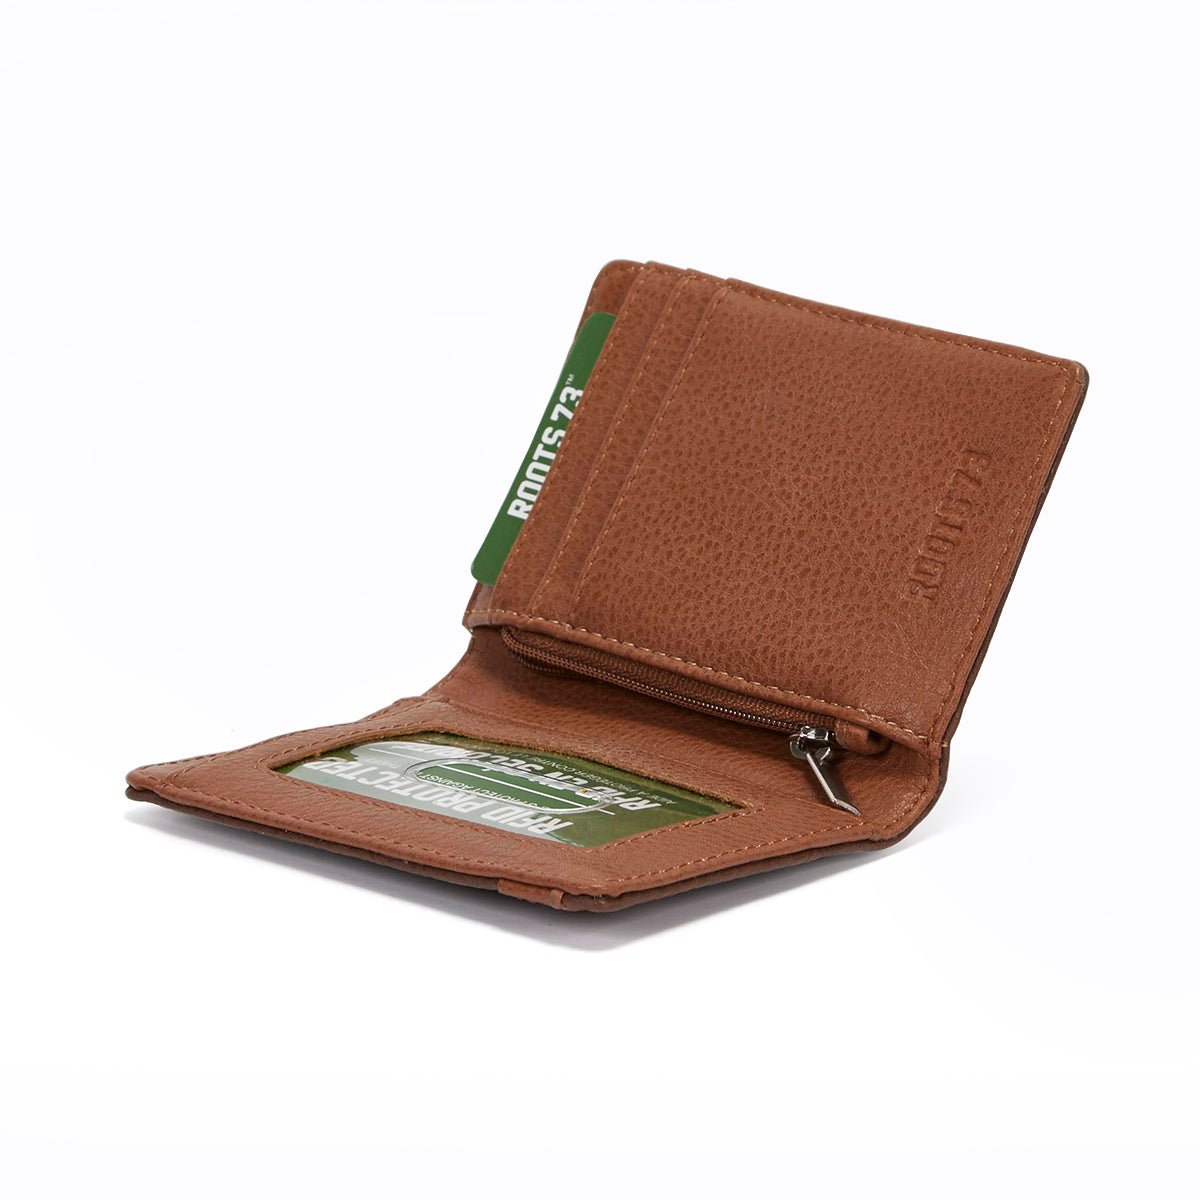 Portefeuille Tracker, brun/cognac, hom